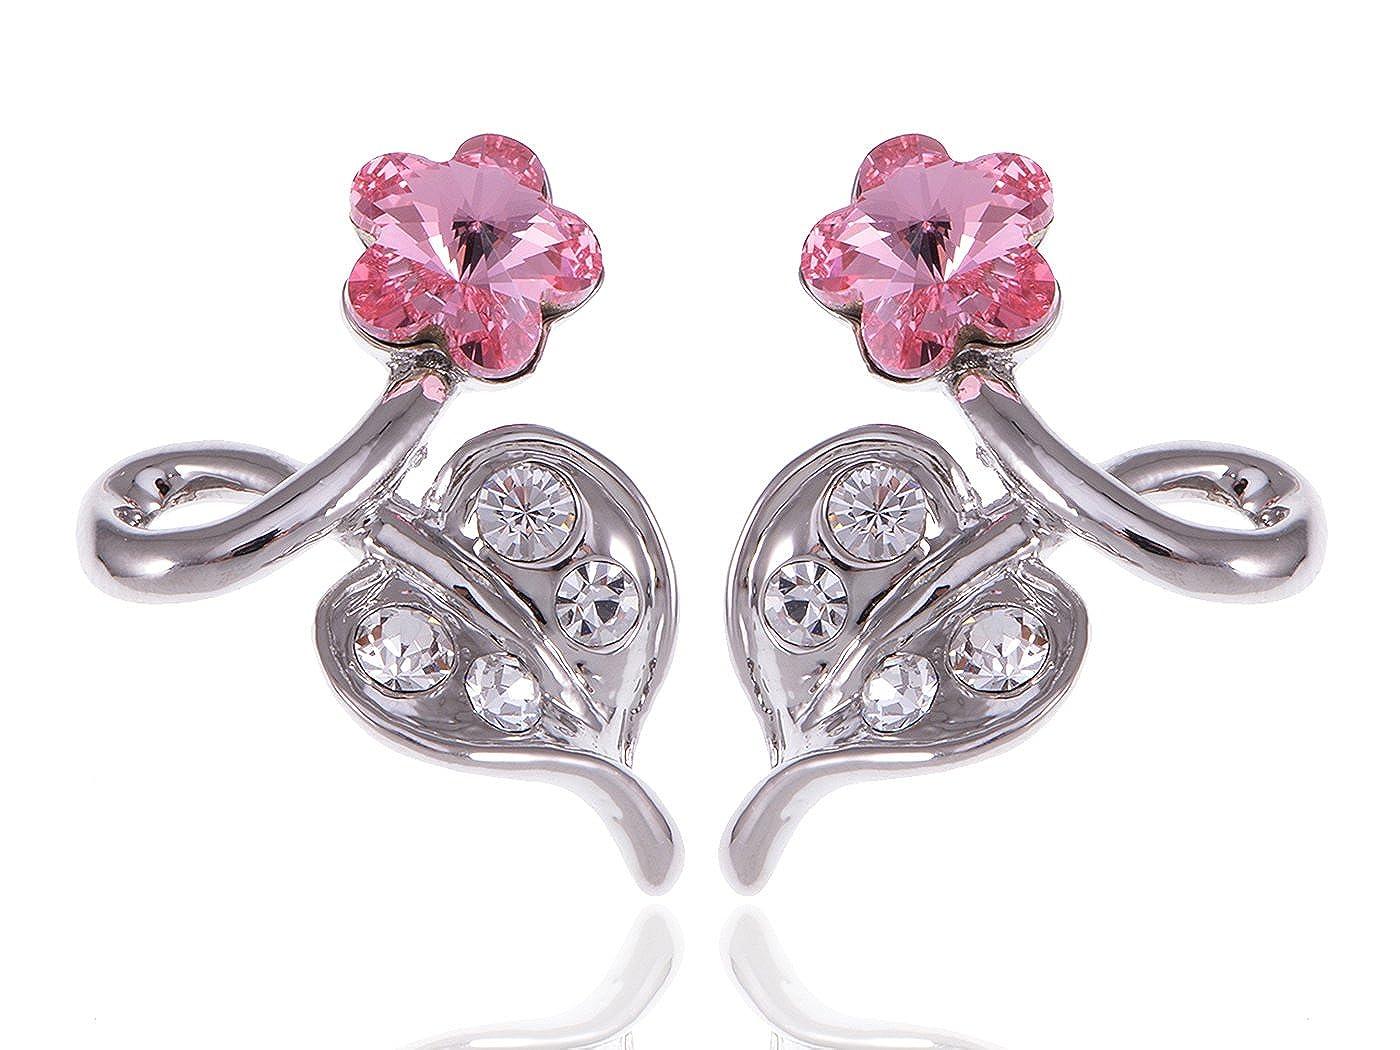 eab9af836 Amazon.com: Alilang Womens Swarovski Crystal Element Silver Tone Pink  Flower Leaf Swirl Stud Earrings: Dangle Earrings: Jewelry